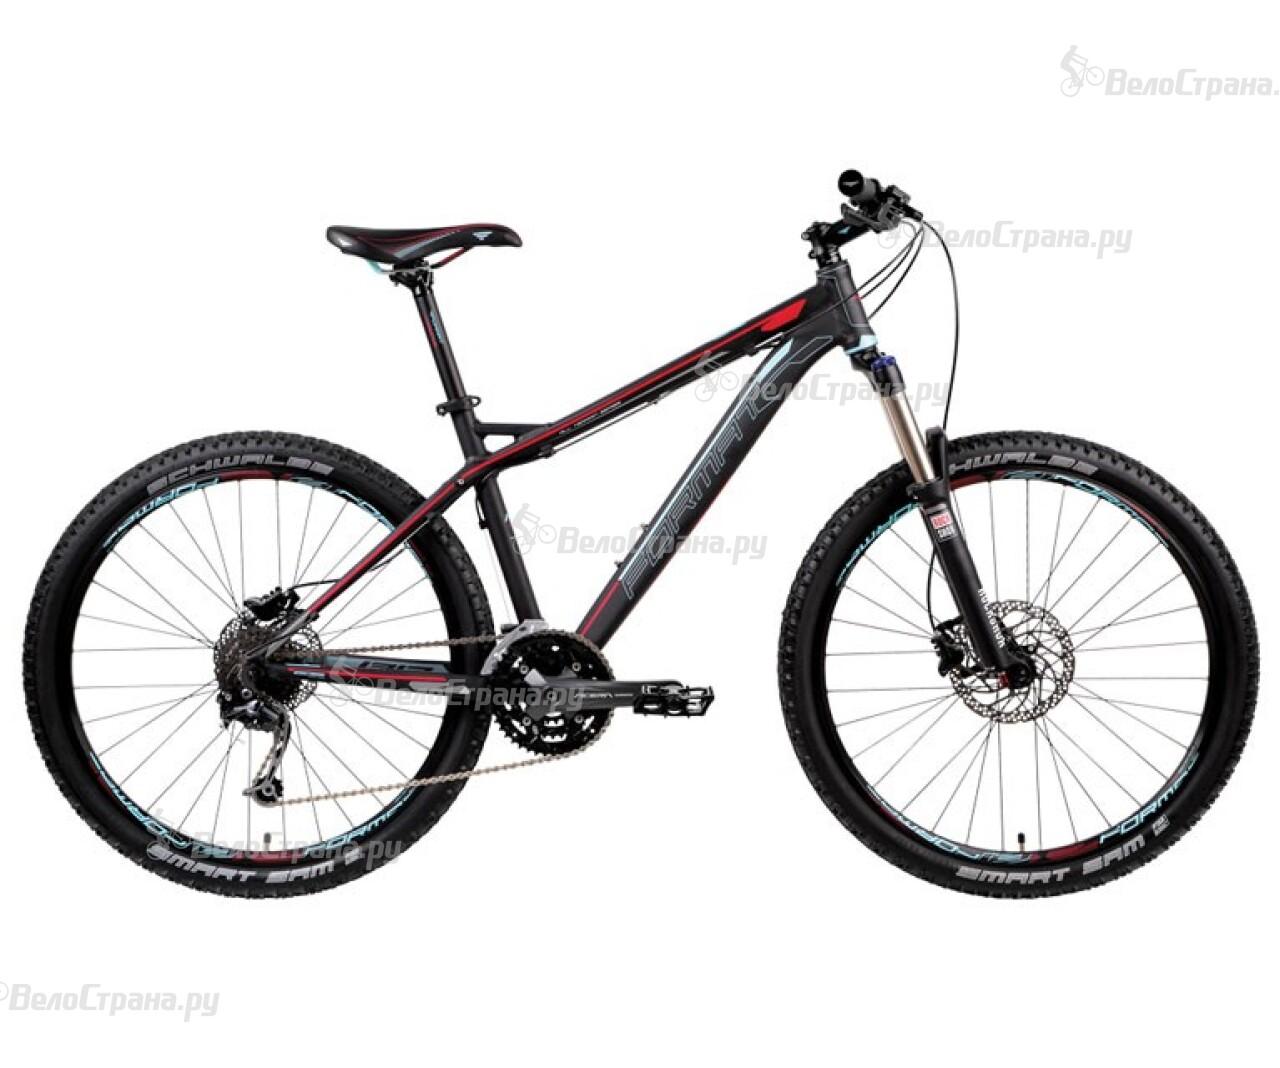 Велосипед Format 1313 (2014) цена